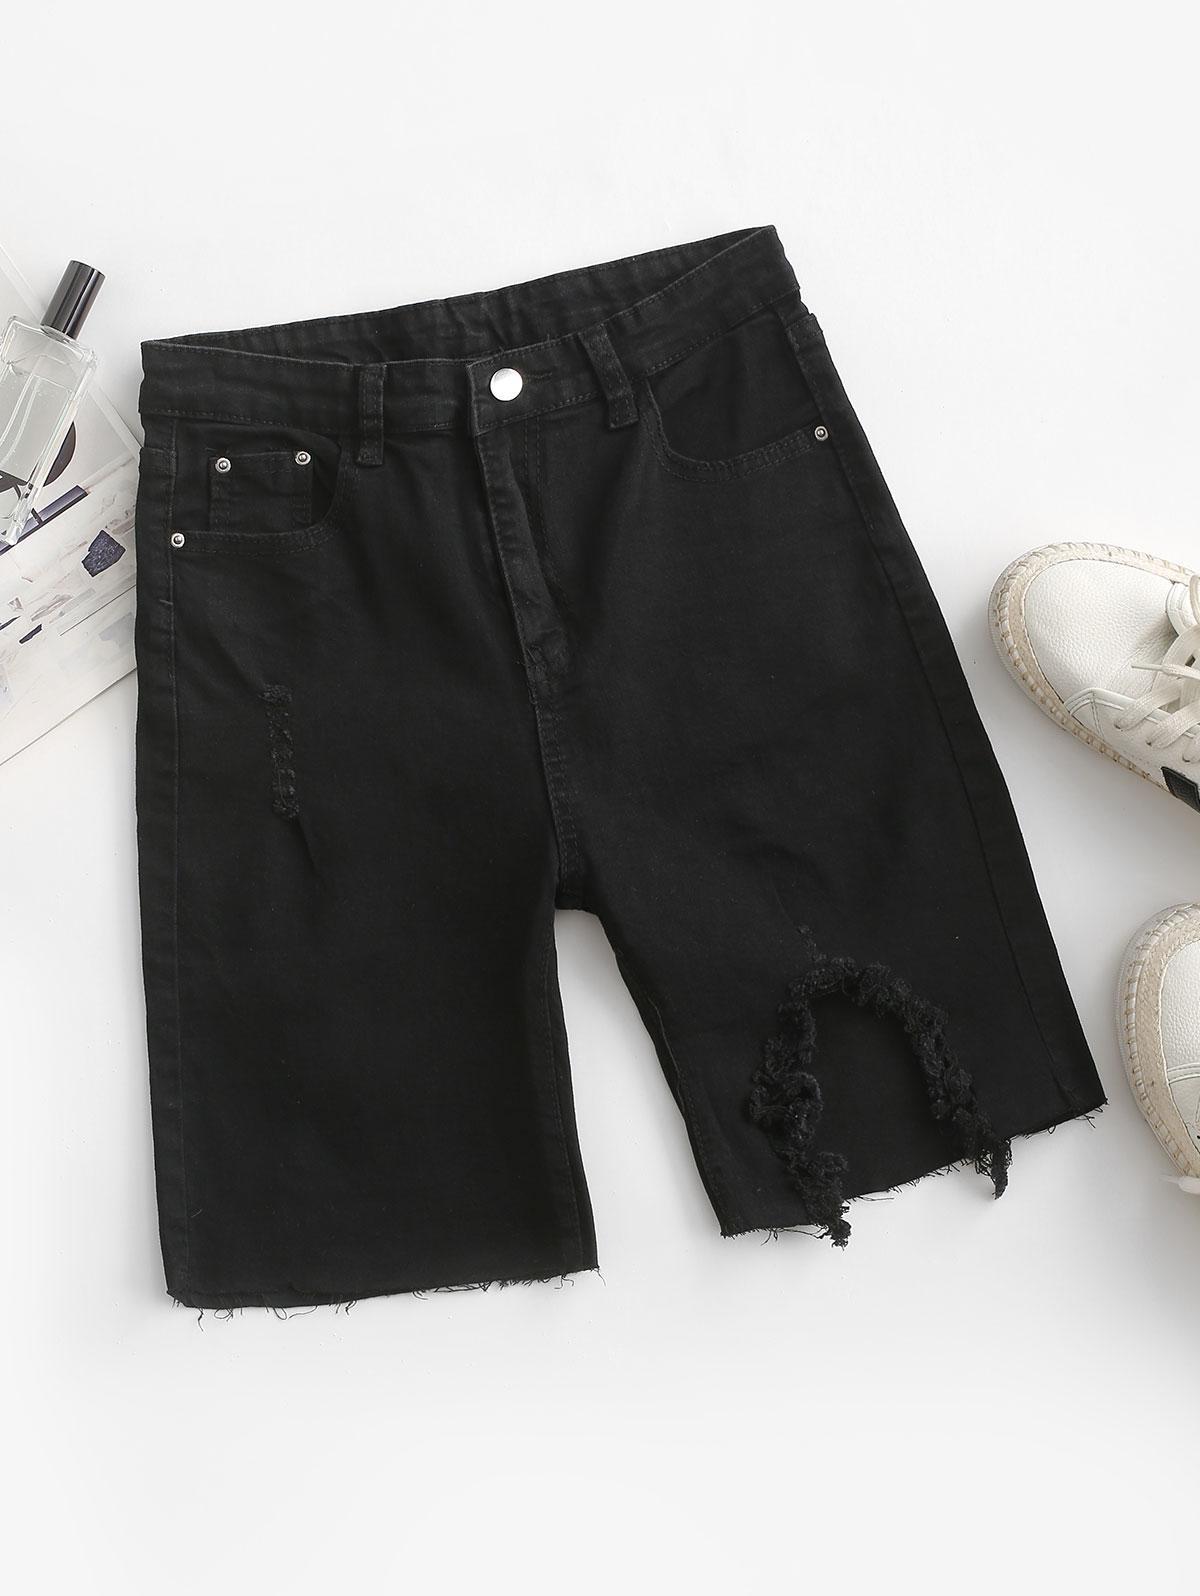 Frayed Distressed Denim Bermuda Shorts